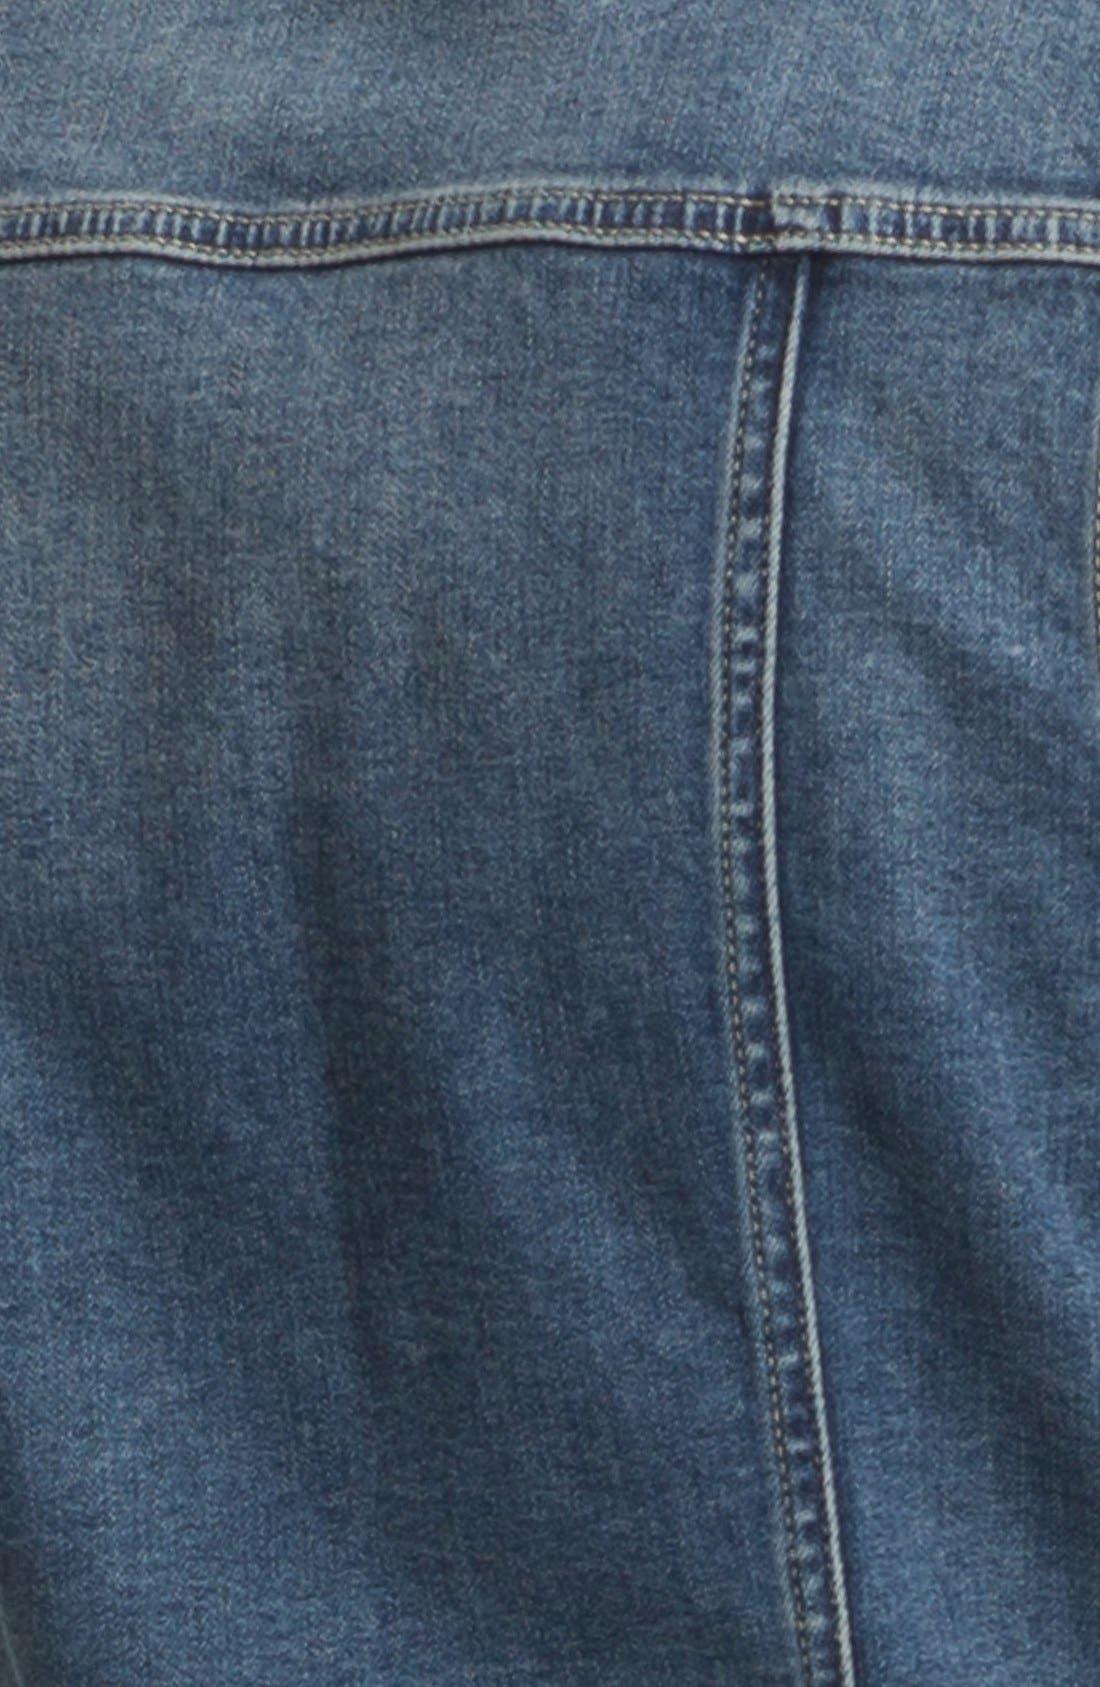 Alternate Image 3  - Two by Vince Camuto Vintage Wash Denim Vest (Petite)